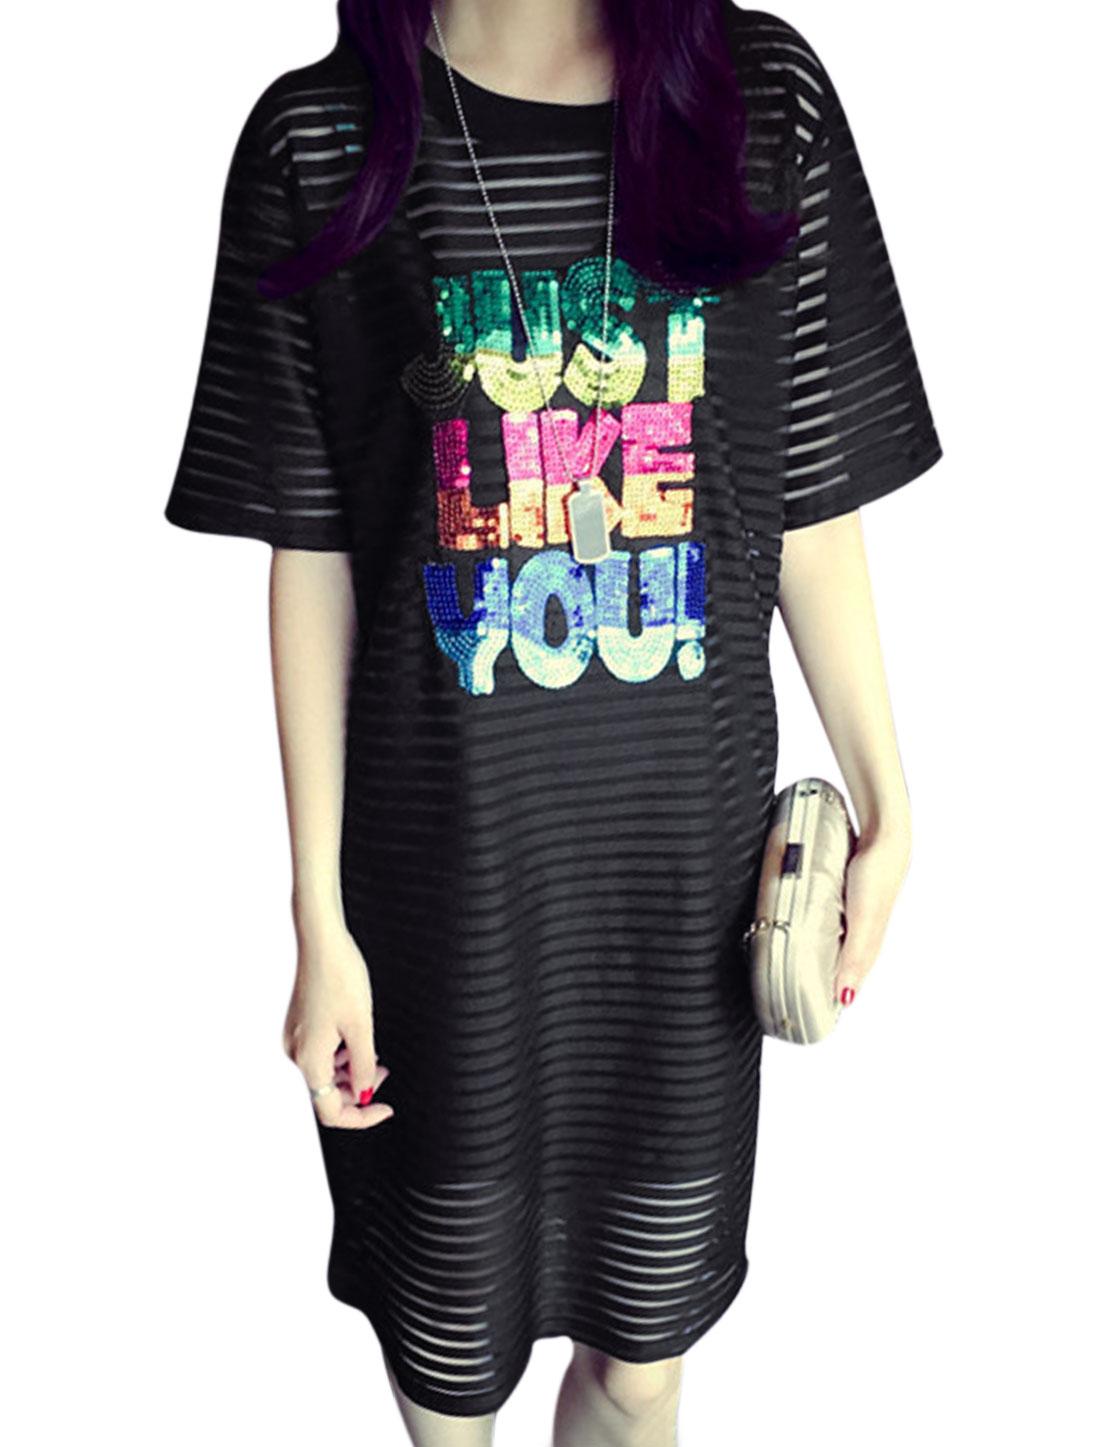 Lady Semi Sheer Straight Dress w Spaghetti Straps Tank Top Black S